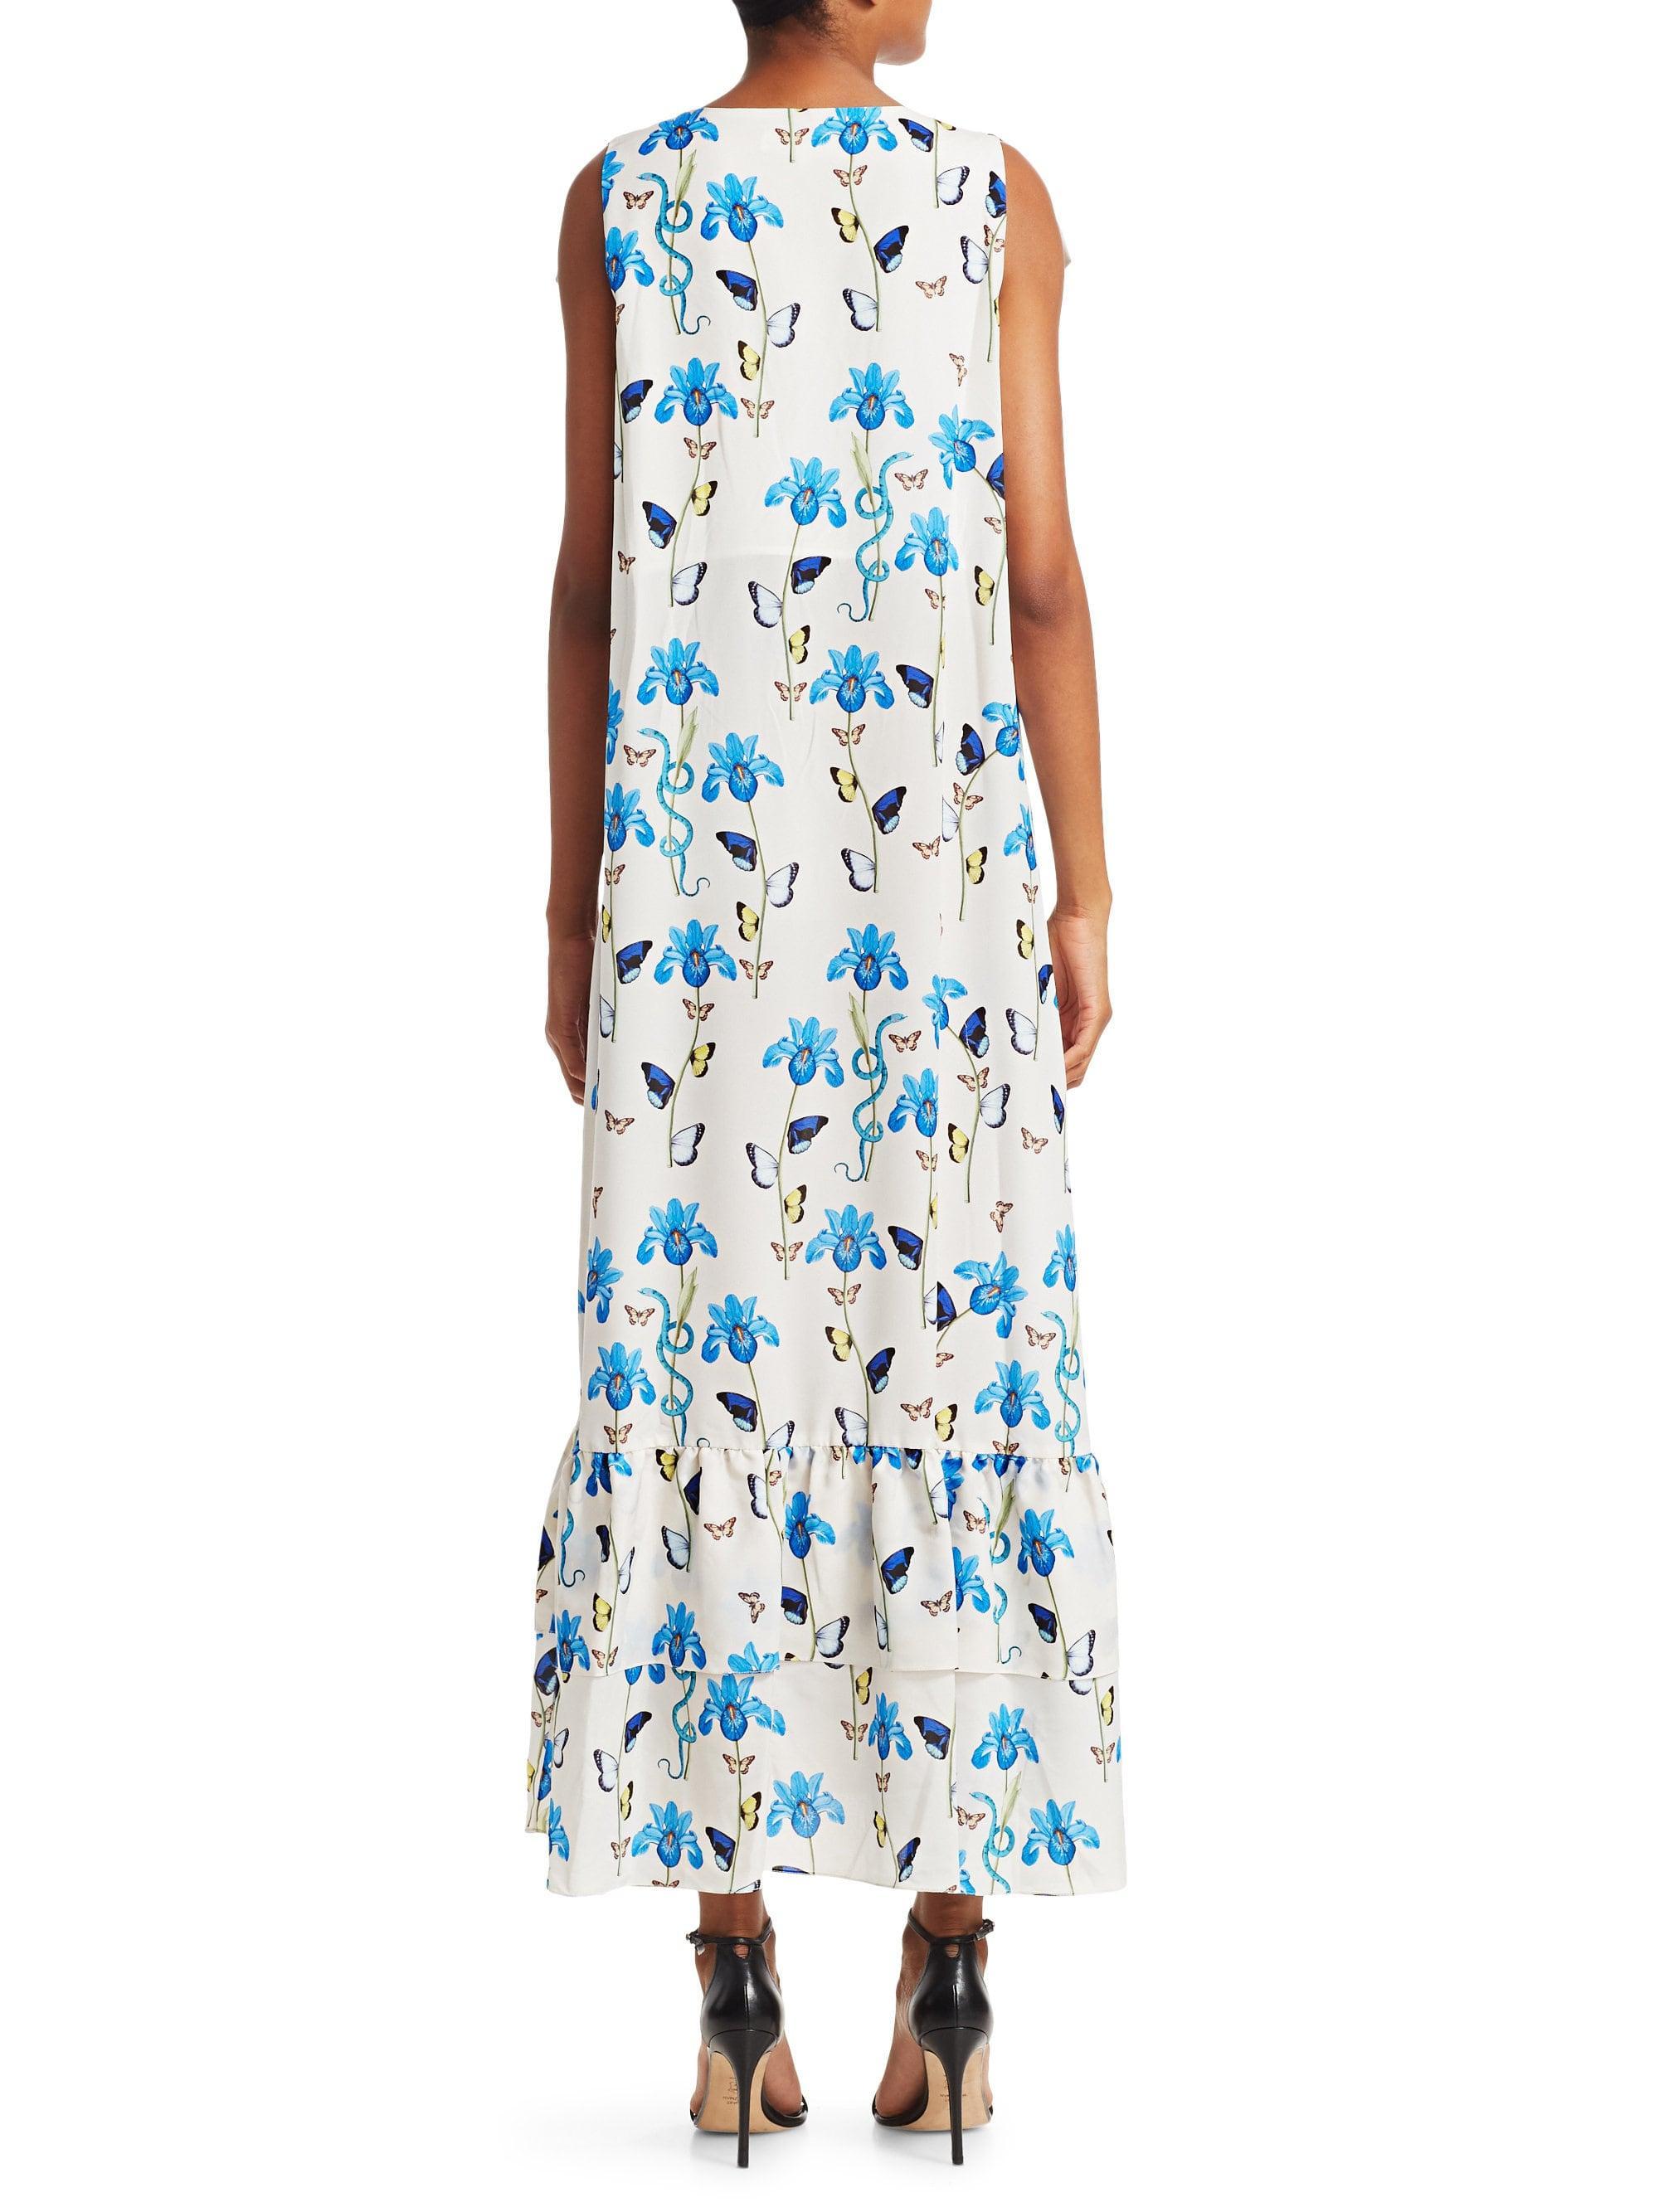 9ae27d7085a Lyst - Borgo De Nor Women s Carlotta Tie-waist Maxi Dress - Iris Ivory -  Size Uk 6 (2) in Blue